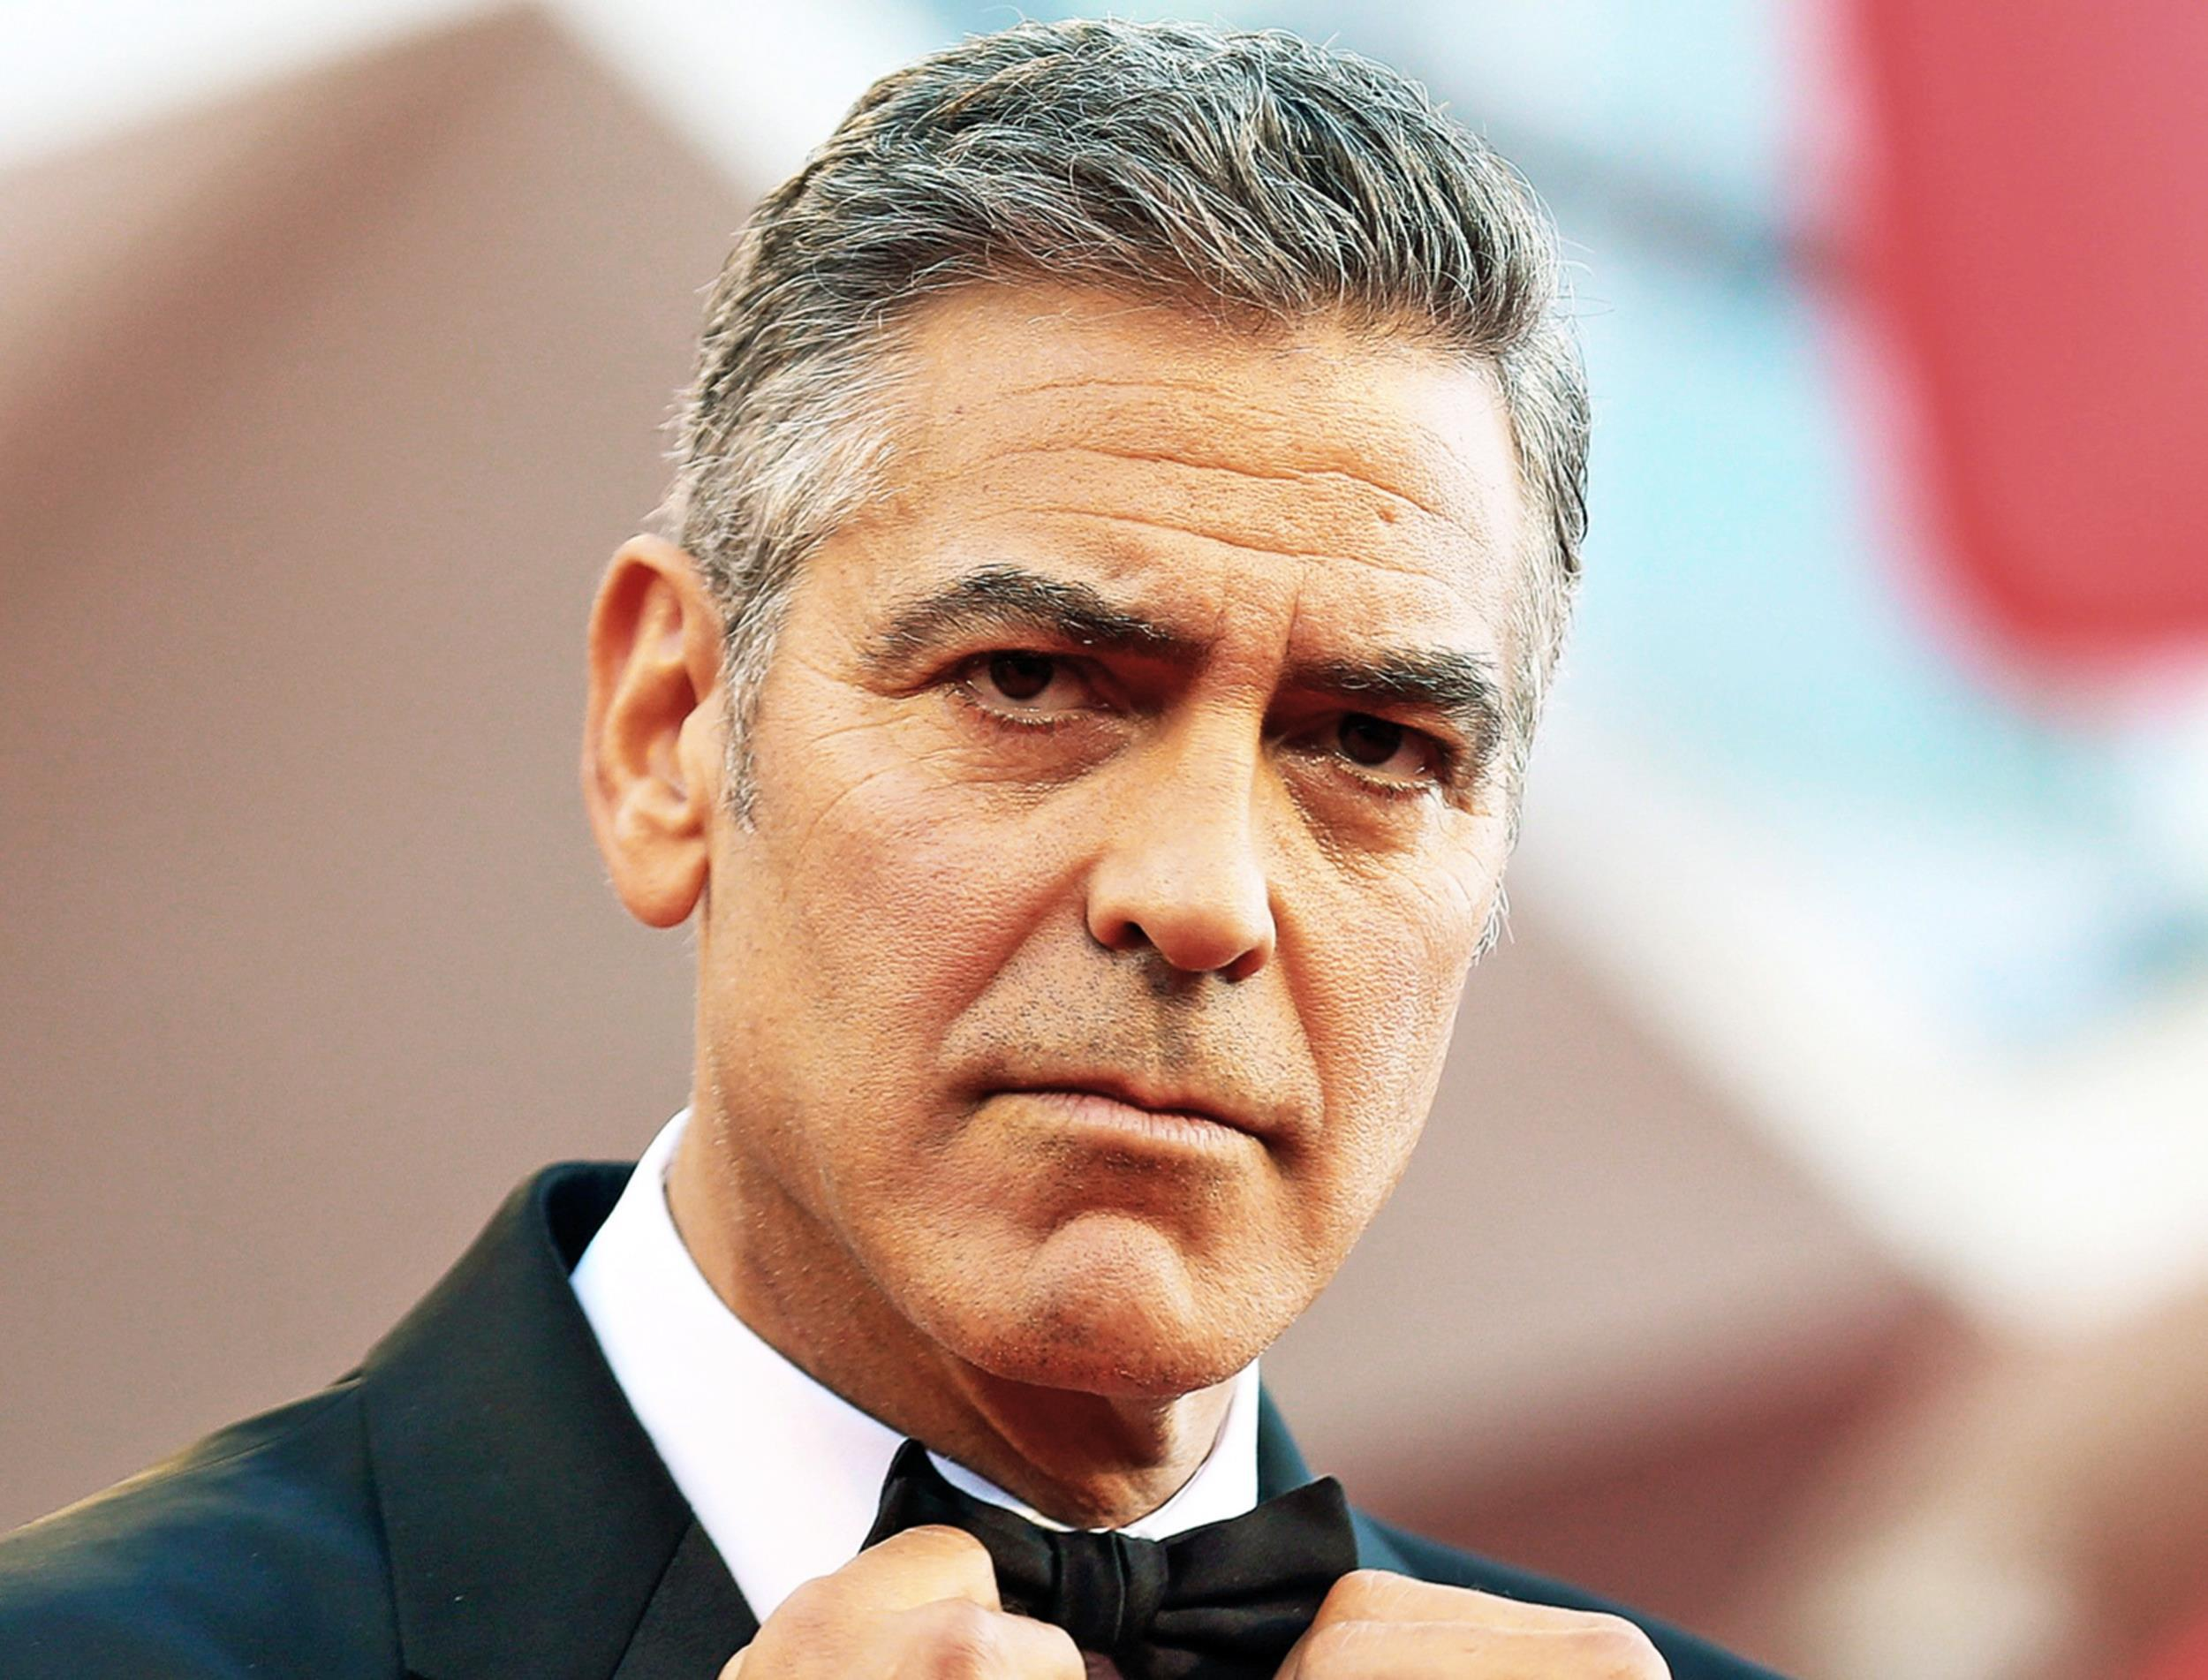 George Clooney Wallpapers